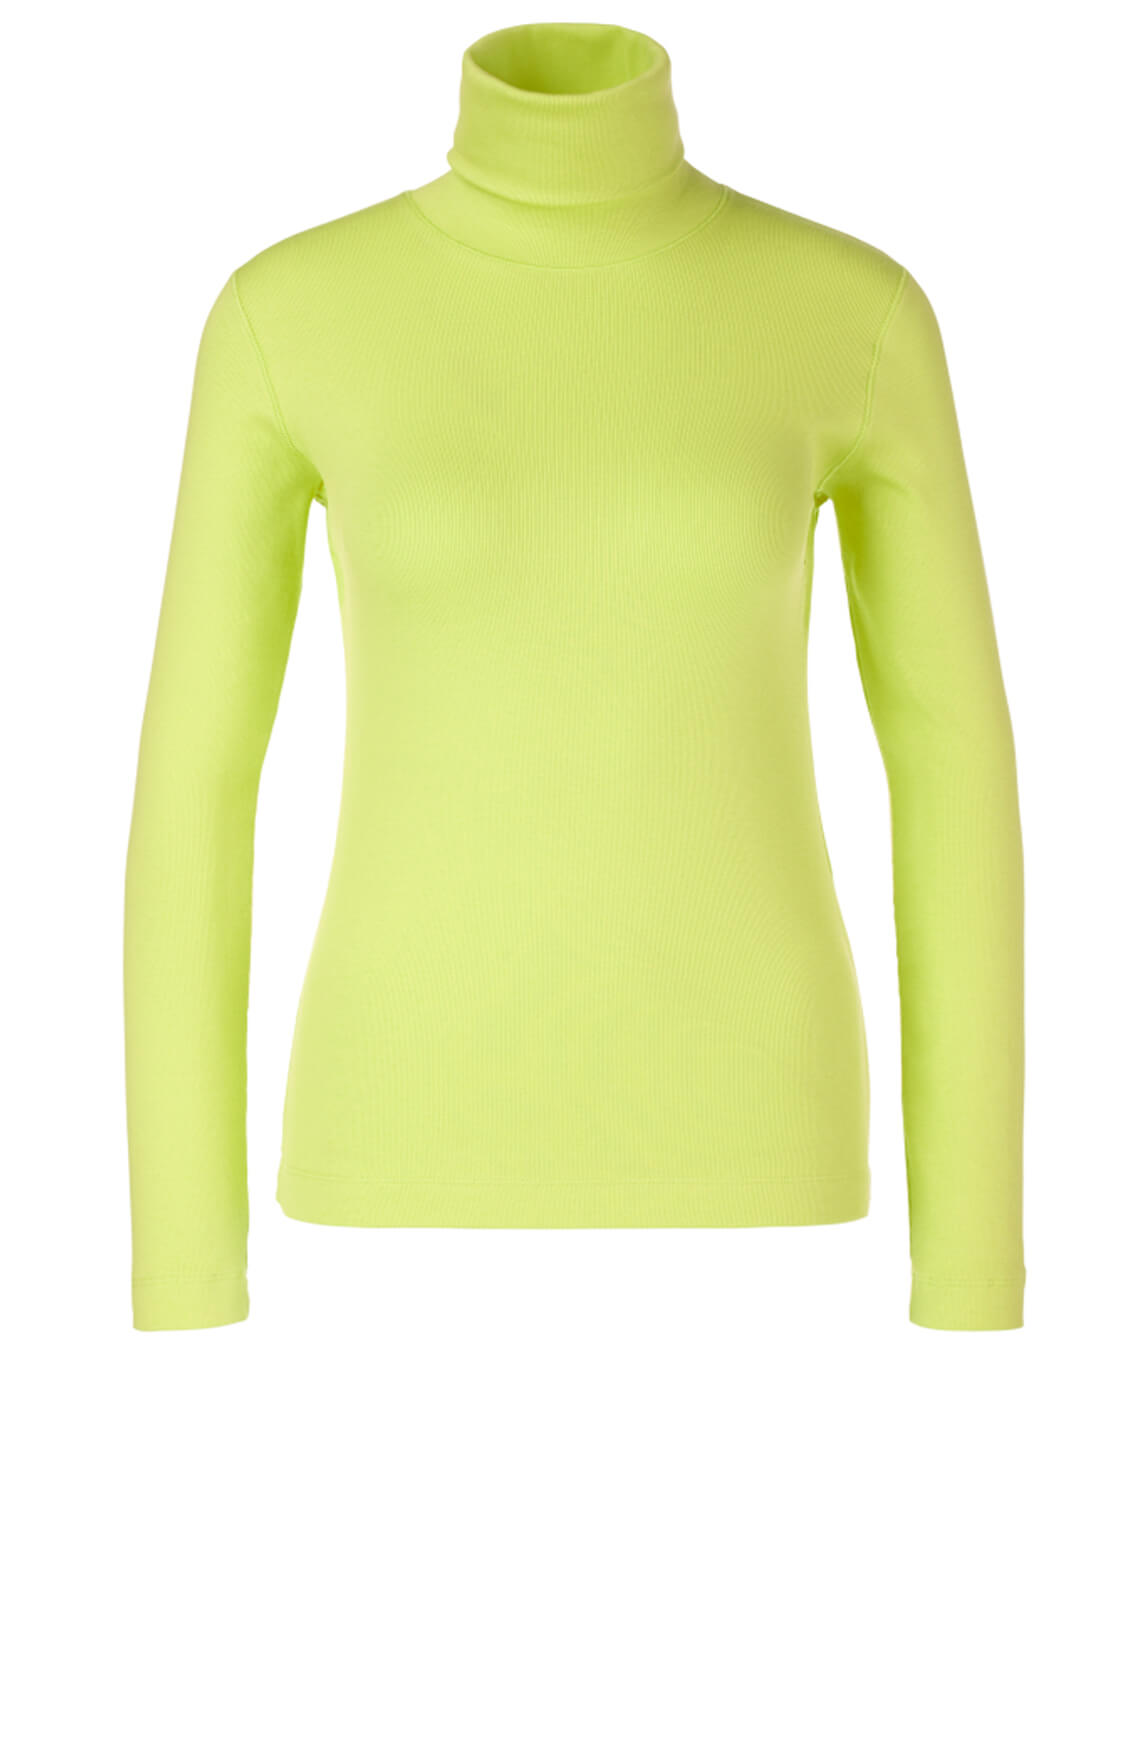 Marccain Sports Dames Shirt met rolkraag geel